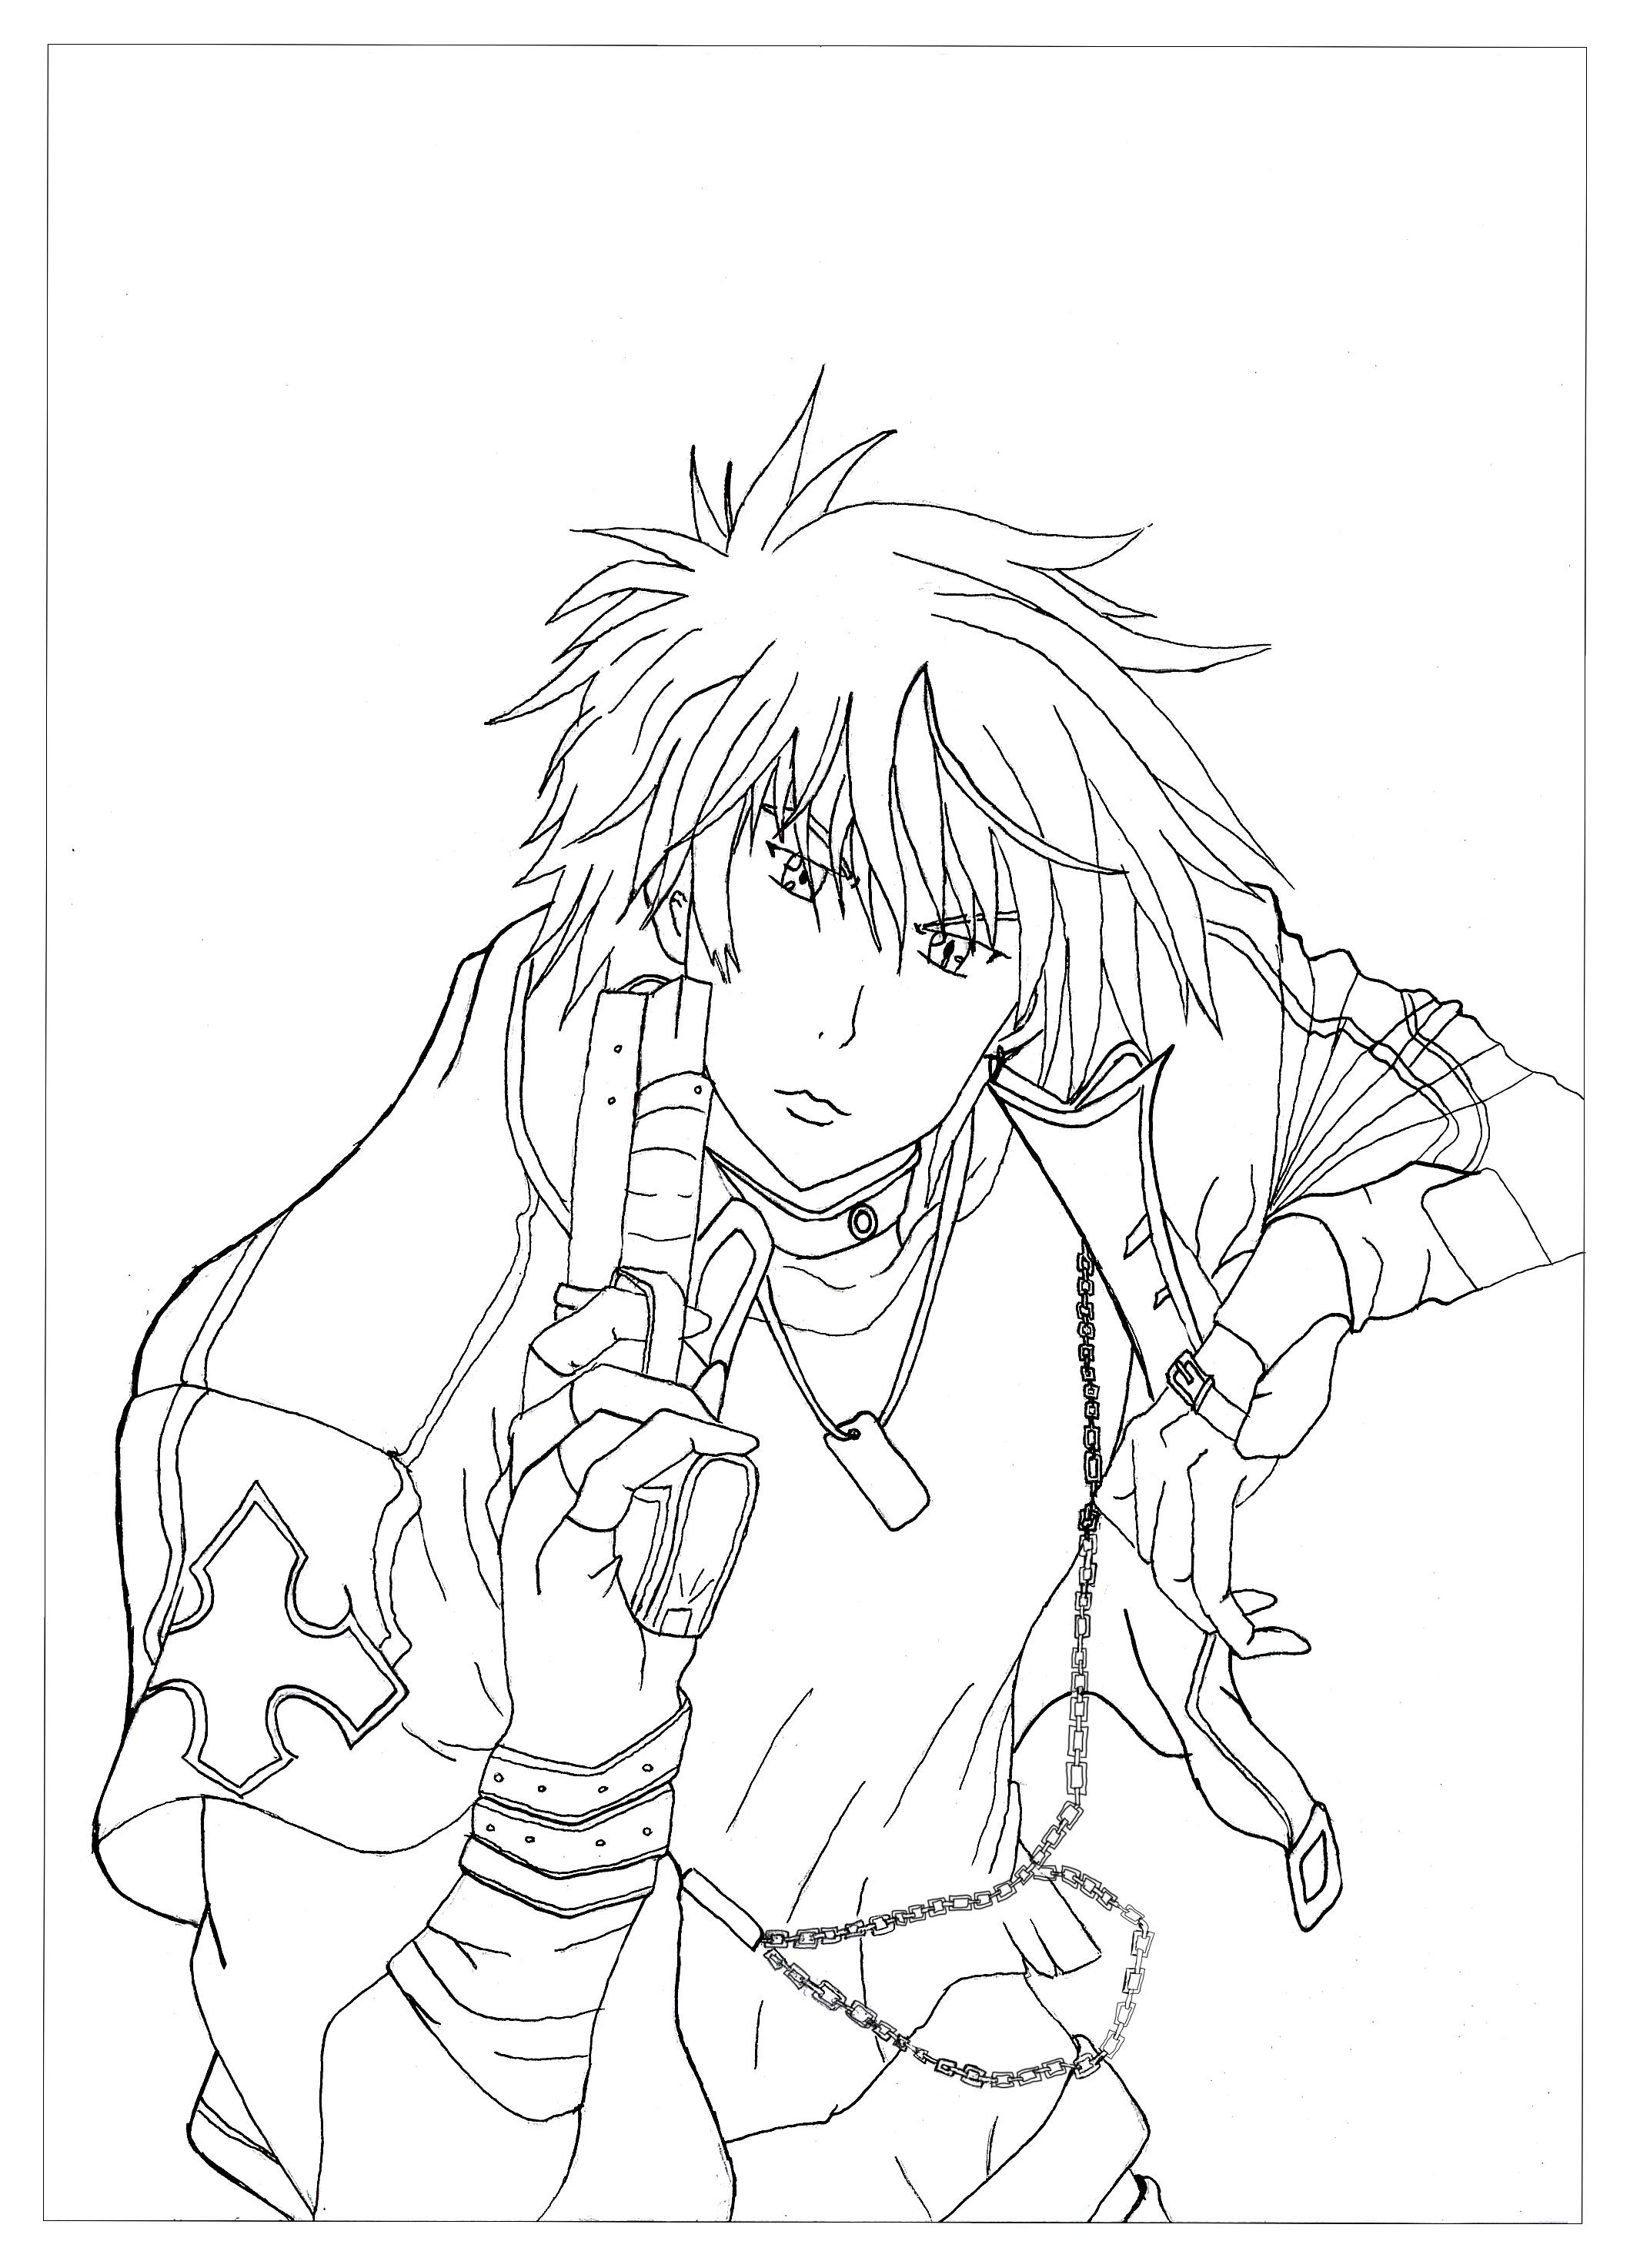 Mangas 6929 mangas malbuch fur erwachsene - Coloriage de mangas ...